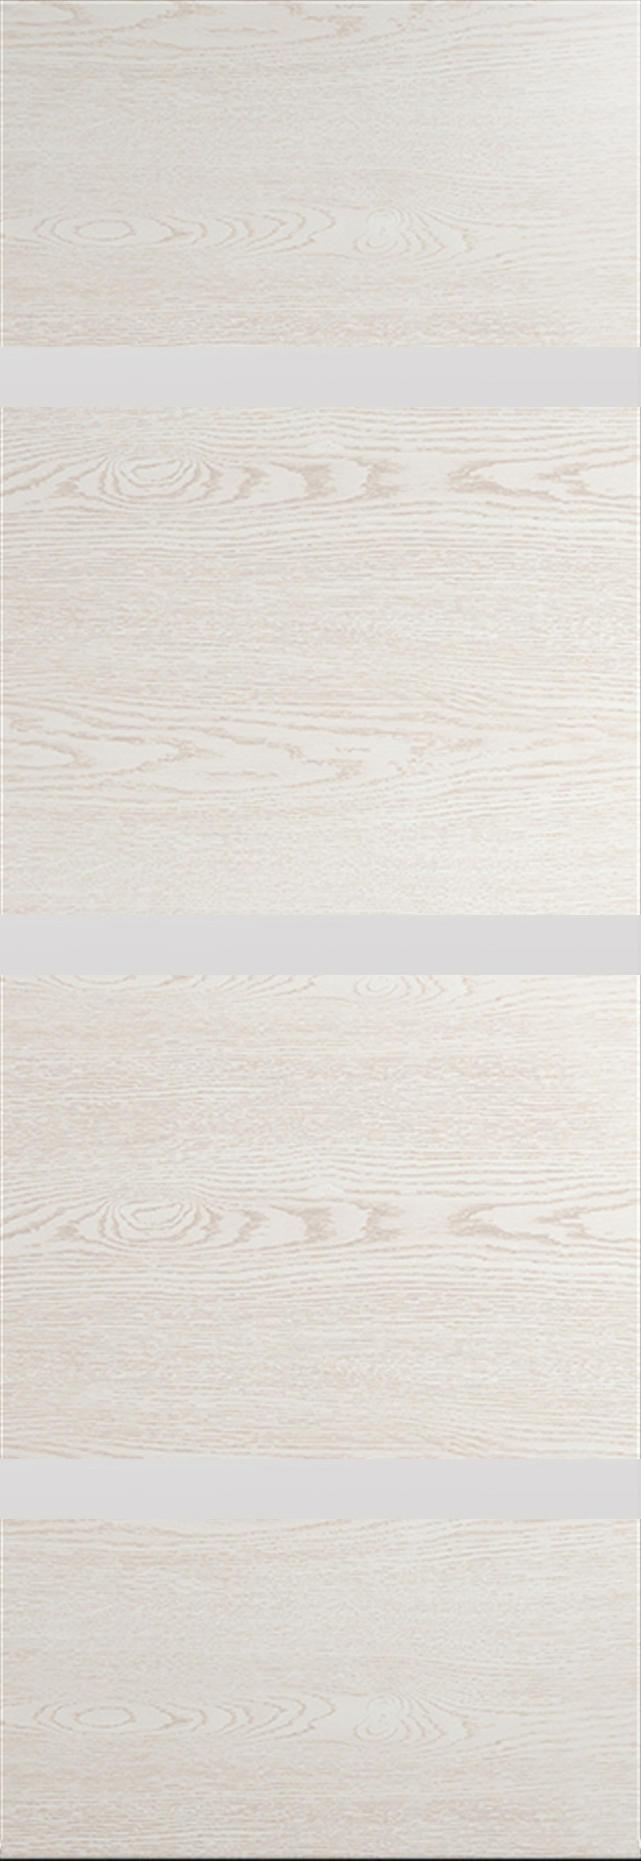 Tivoli Г-4 Invisible цвет - Белый ясень Без стекла (ДГ)